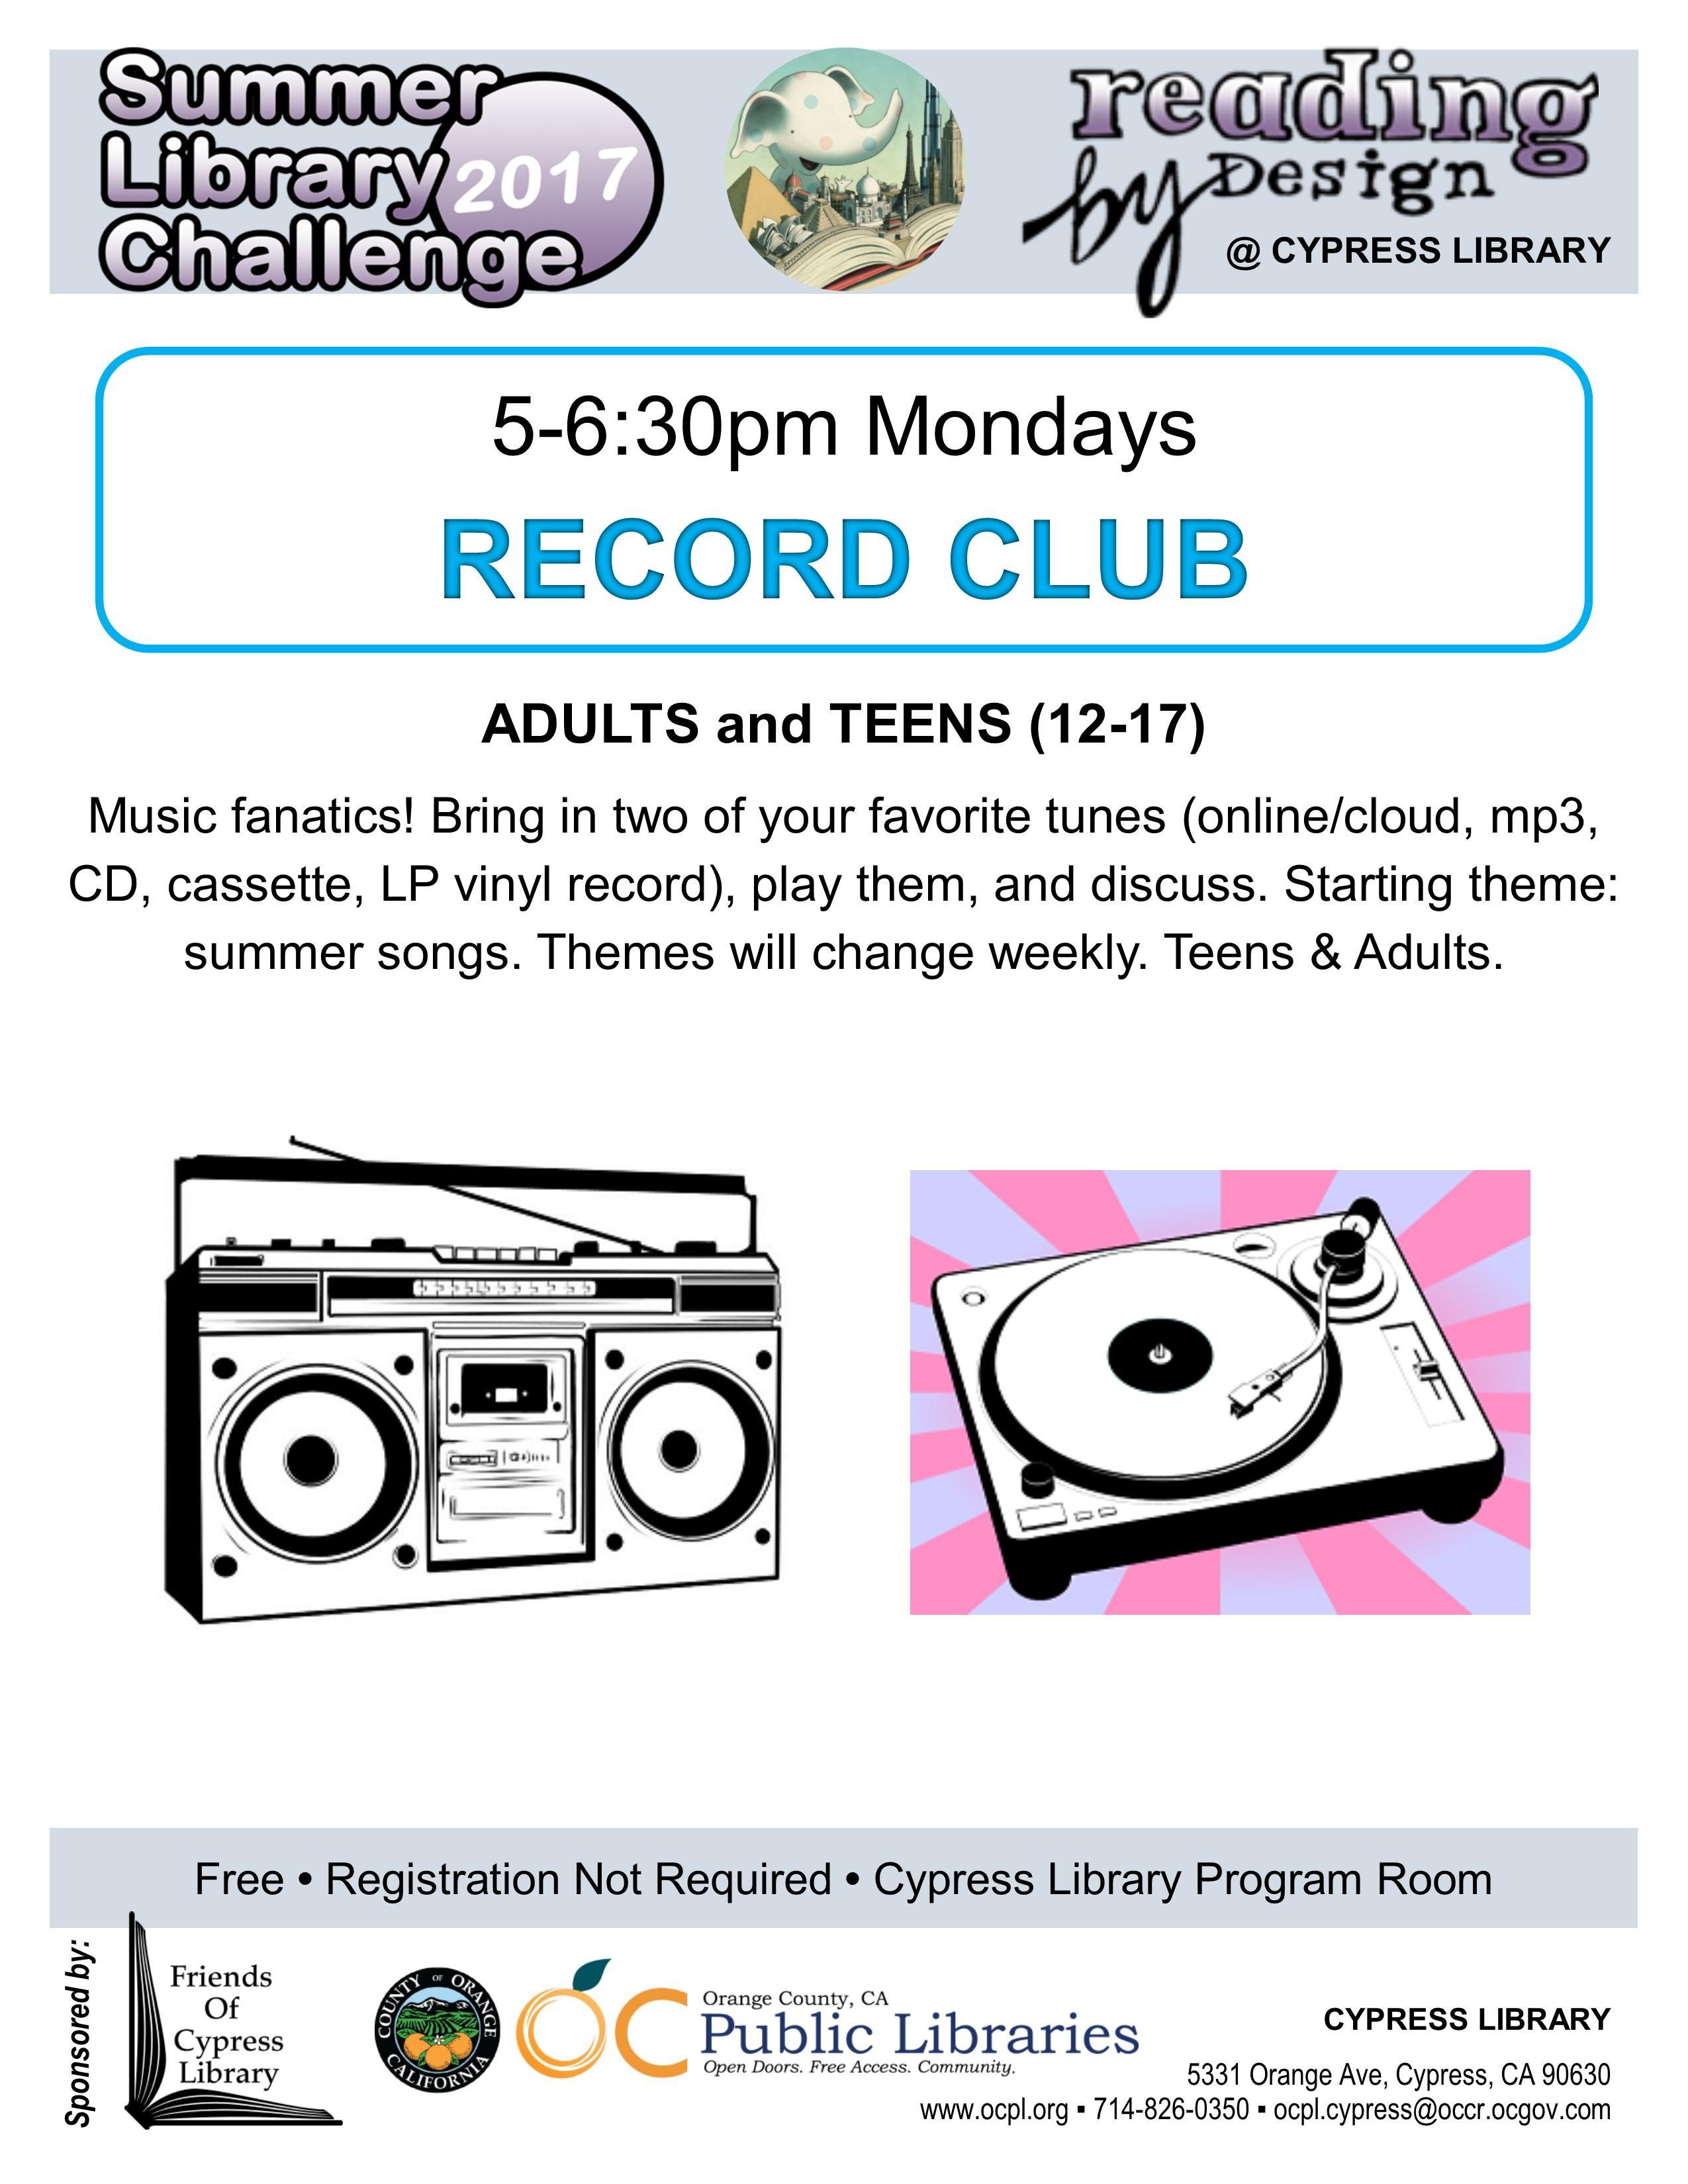 Cypress Library Record Club